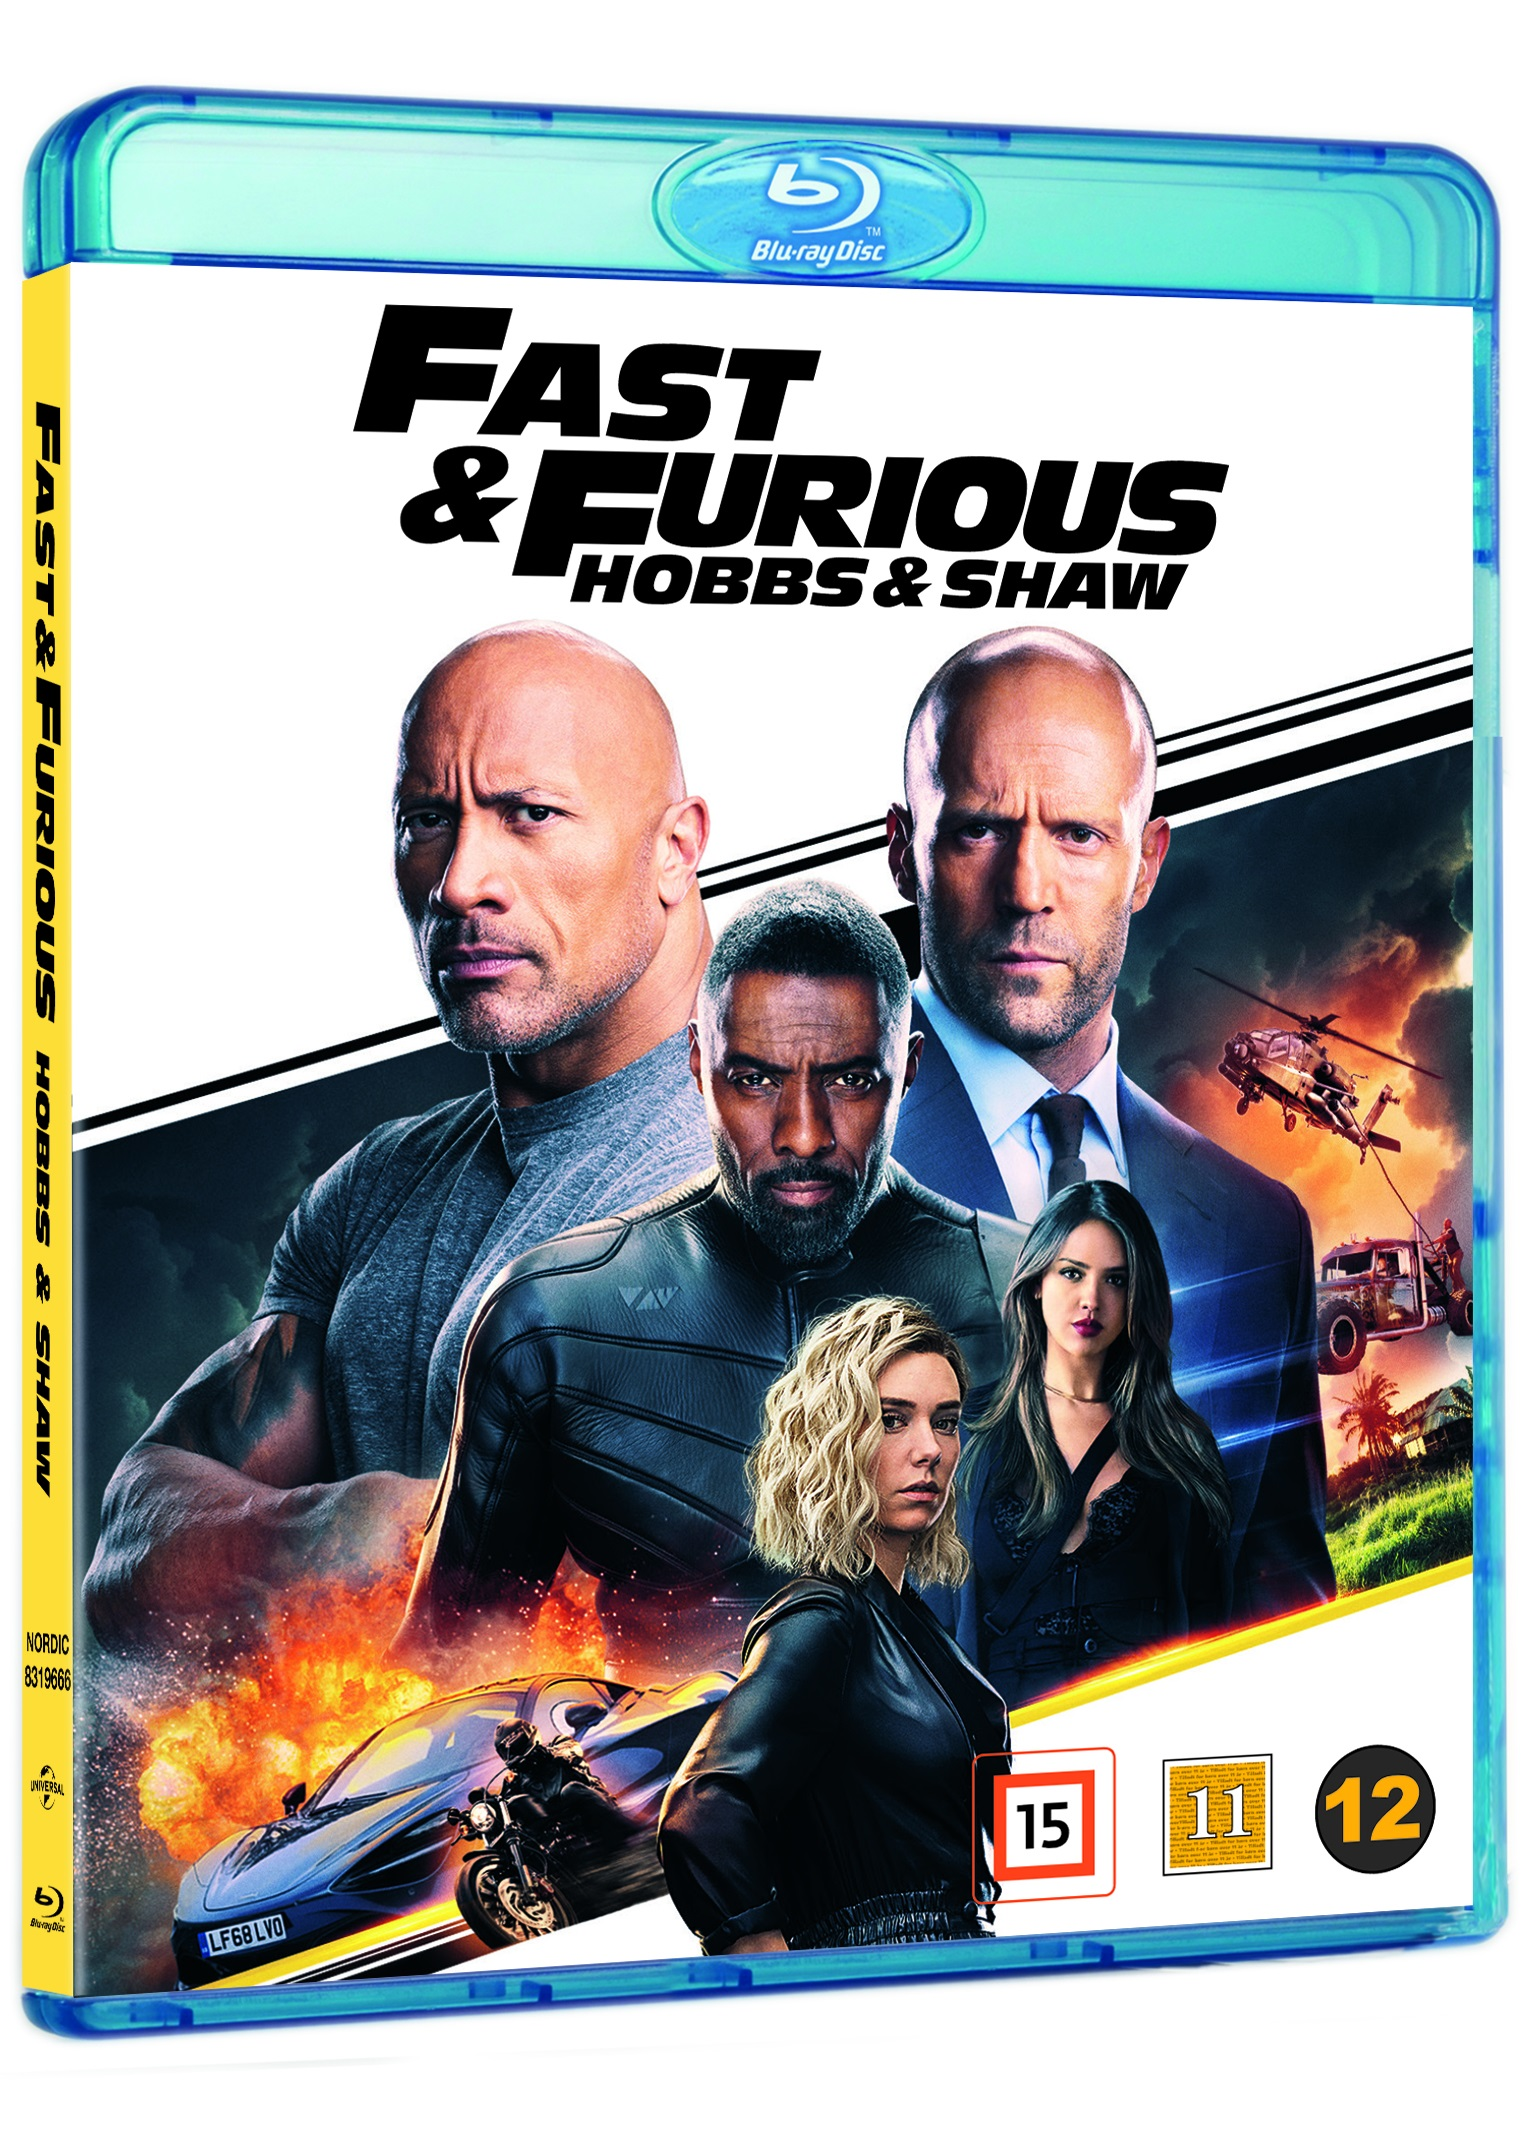 Fast & Furious: Hobbs & Shaw -  - Film -  - 5053083196660 - 12/12-2019